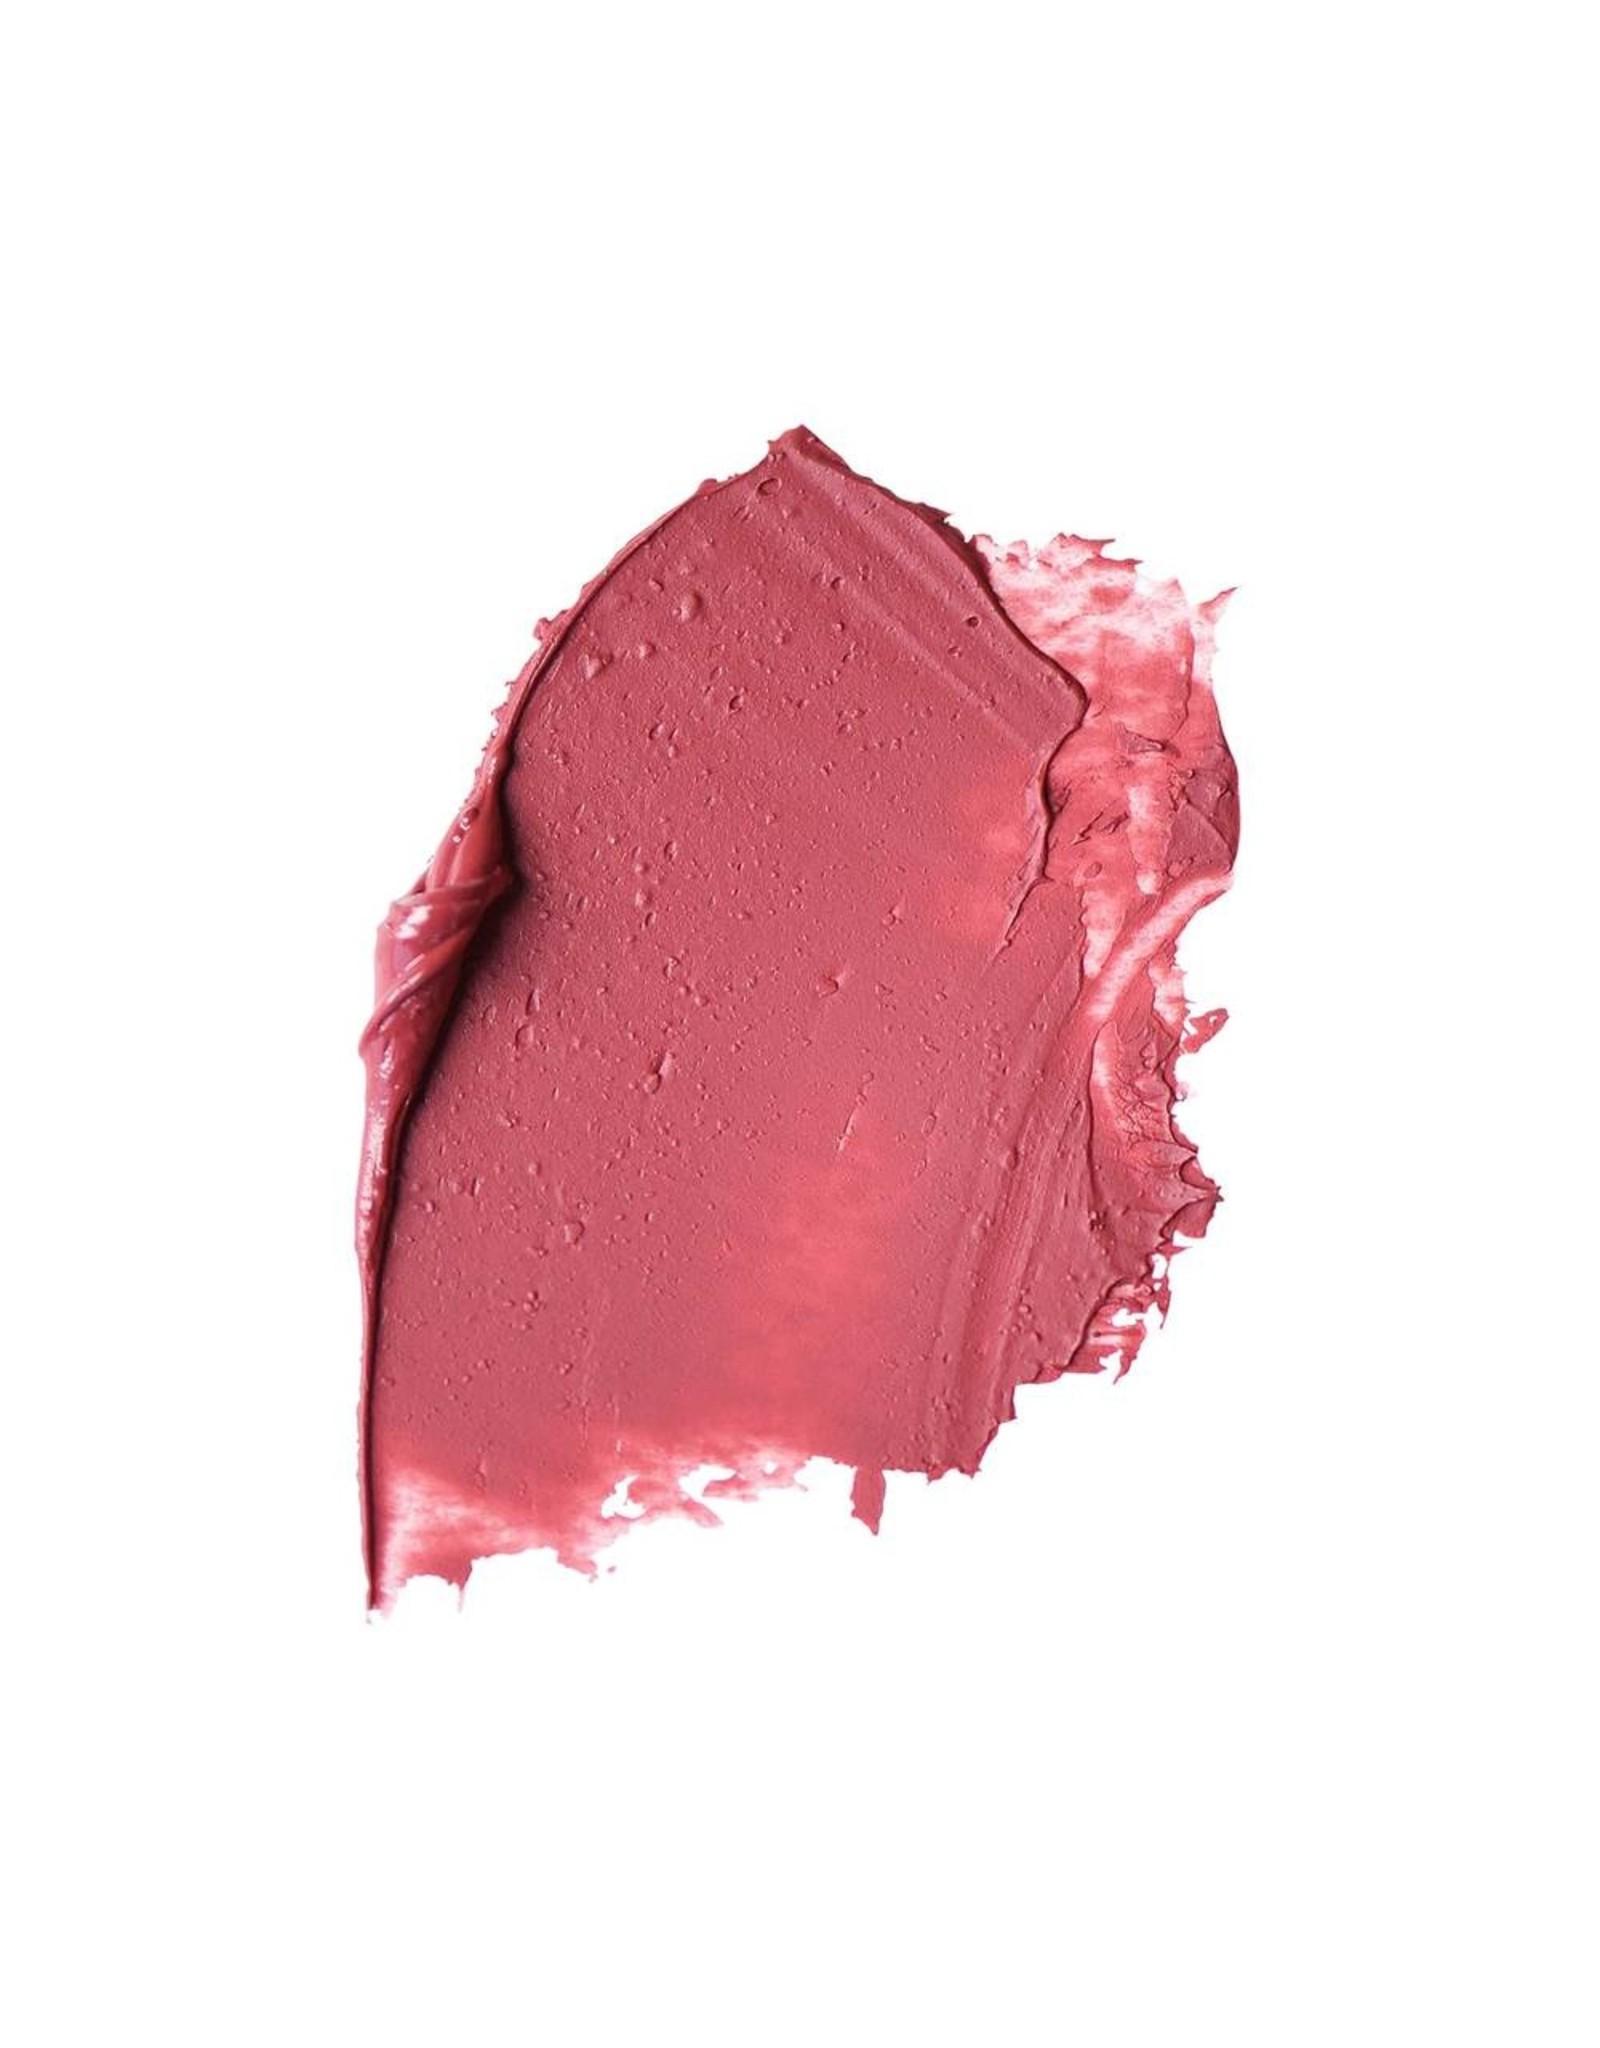 Kosas Kosas Weightless Lip Color: Rosewater